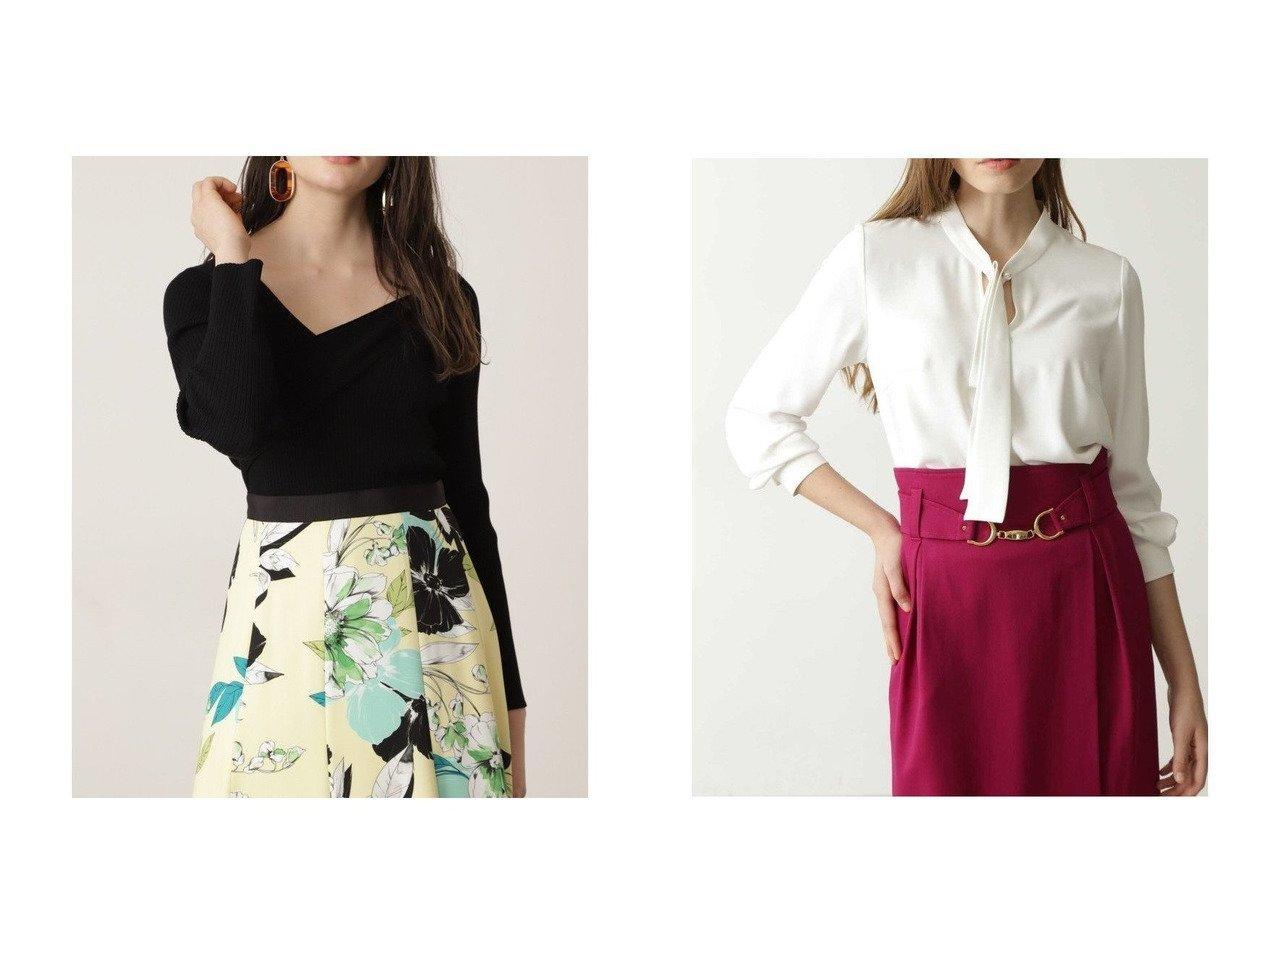 【Pinky&Dianne/ピンキーアンドダイアン】のパールピン付きボウブラウス&VネックコードRIBトップス トップス・カットソーのおすすめ!人気、トレンド・レディースファッションの通販  おすすめで人気の流行・トレンド、ファッションの通販商品 メンズファッション・キッズファッション・インテリア・家具・レディースファッション・服の通販 founy(ファニー) https://founy.com/ ファッション Fashion レディースファッション WOMEN トップス Tops Tshirt ニット Knit Tops Vネック V-Neck シャツ/ブラウス Shirts Blouses アシンメトリー ストレッチ リブニット スタンダード バランス パール ワンポイント |ID:crp329100000010579